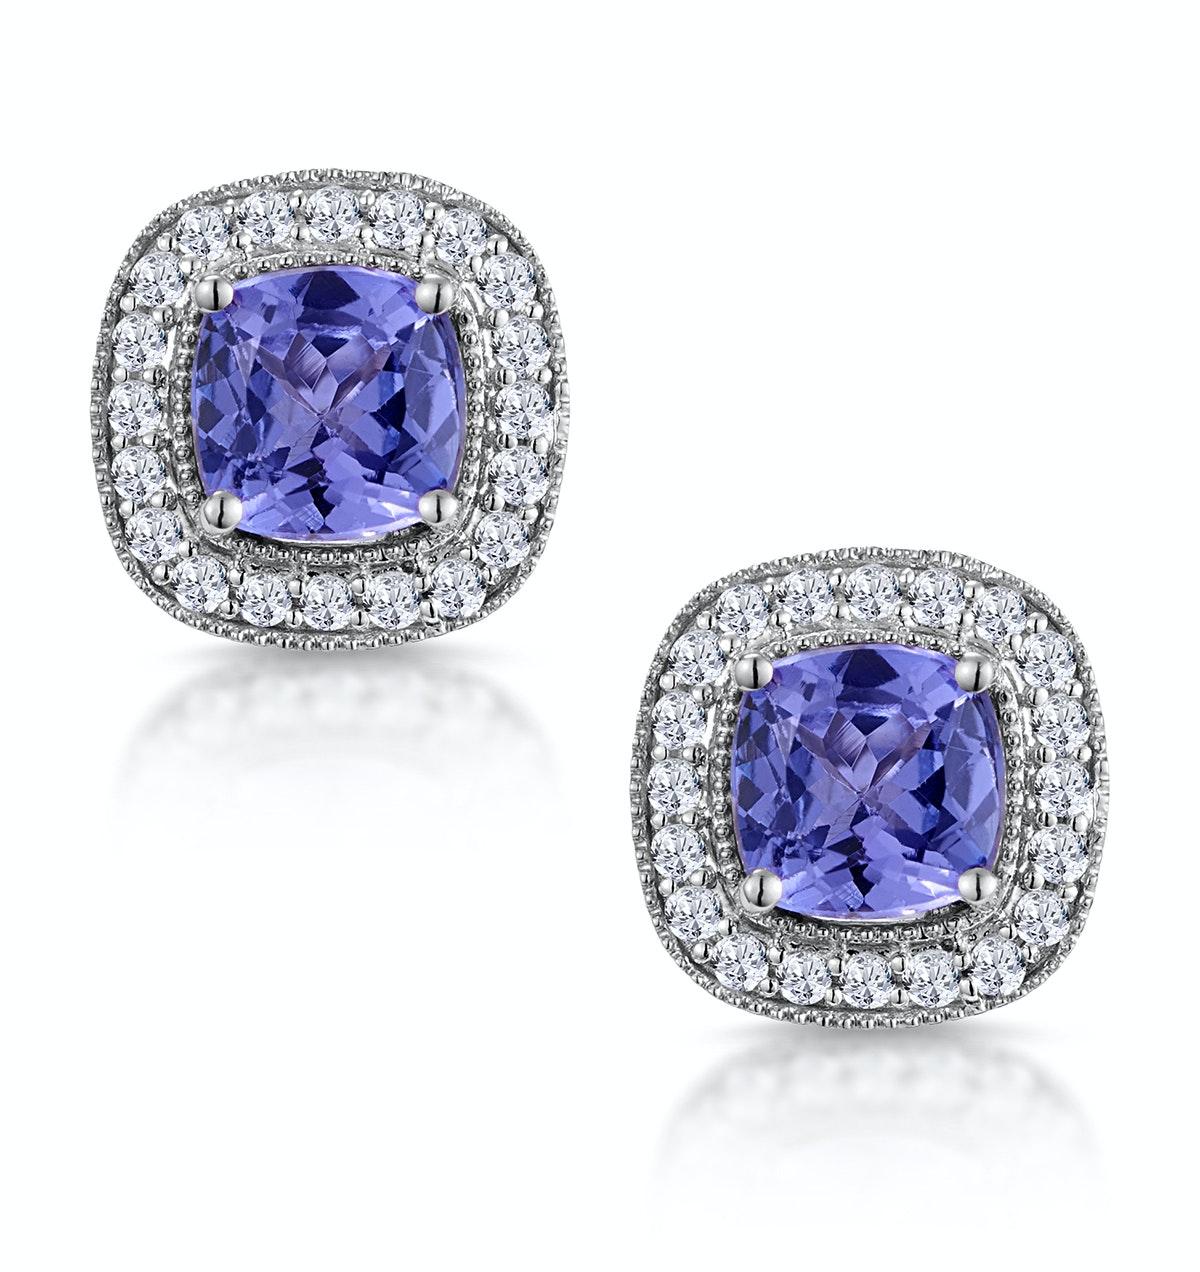 2.20ct Tanzanite Asteria Diamond Halo Earrings in White 18K Gold